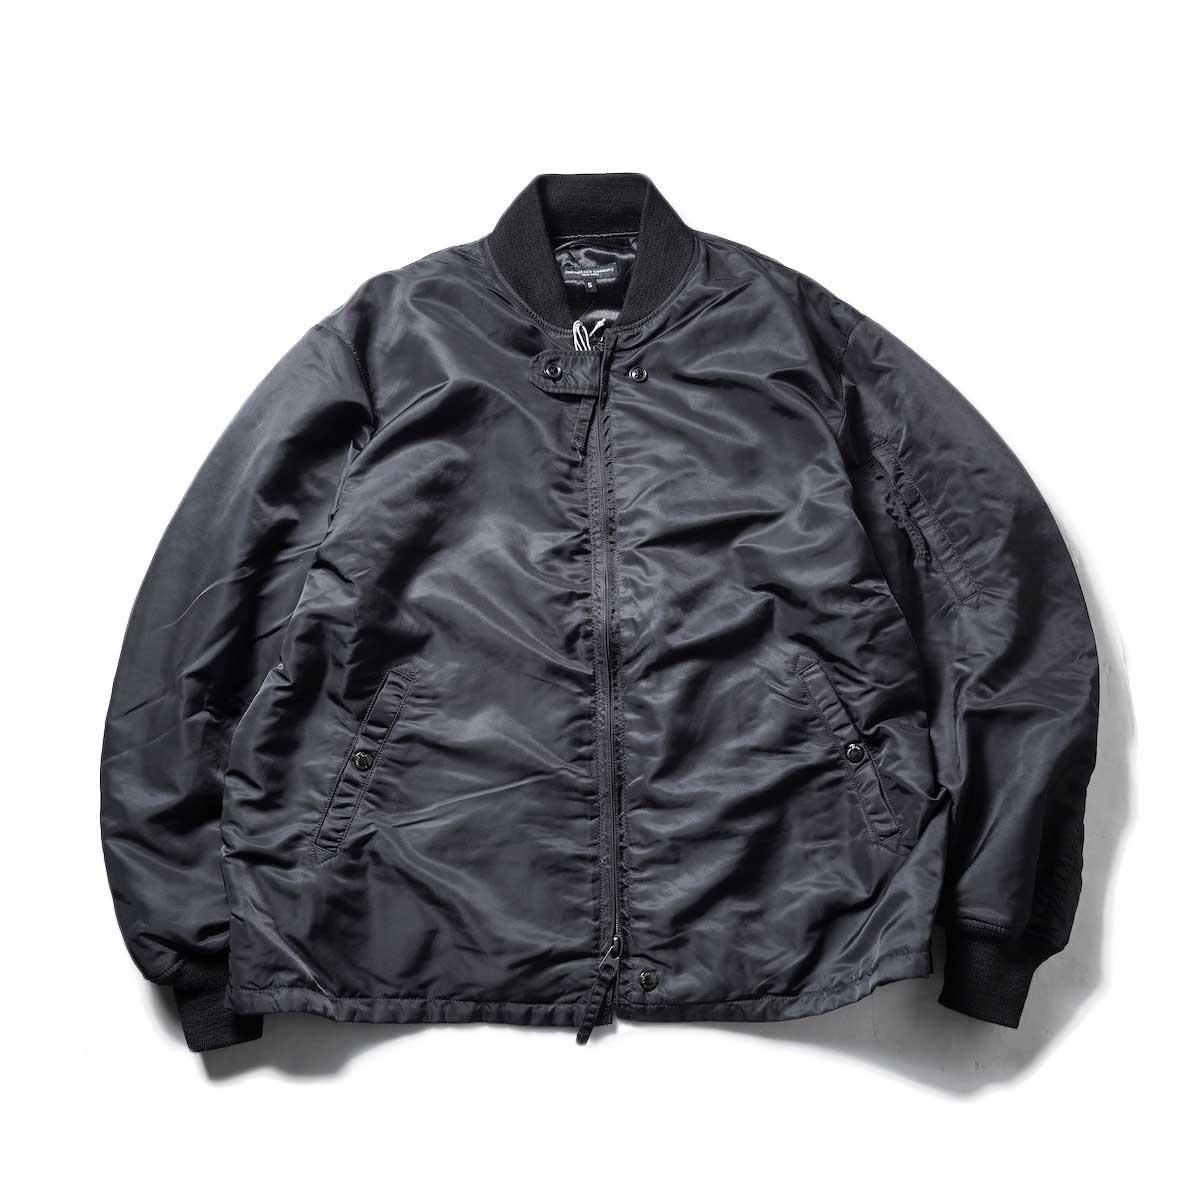 Engineered Garments / AVIATOR JACKET - FLIGHT SATIN NYLON (Black)